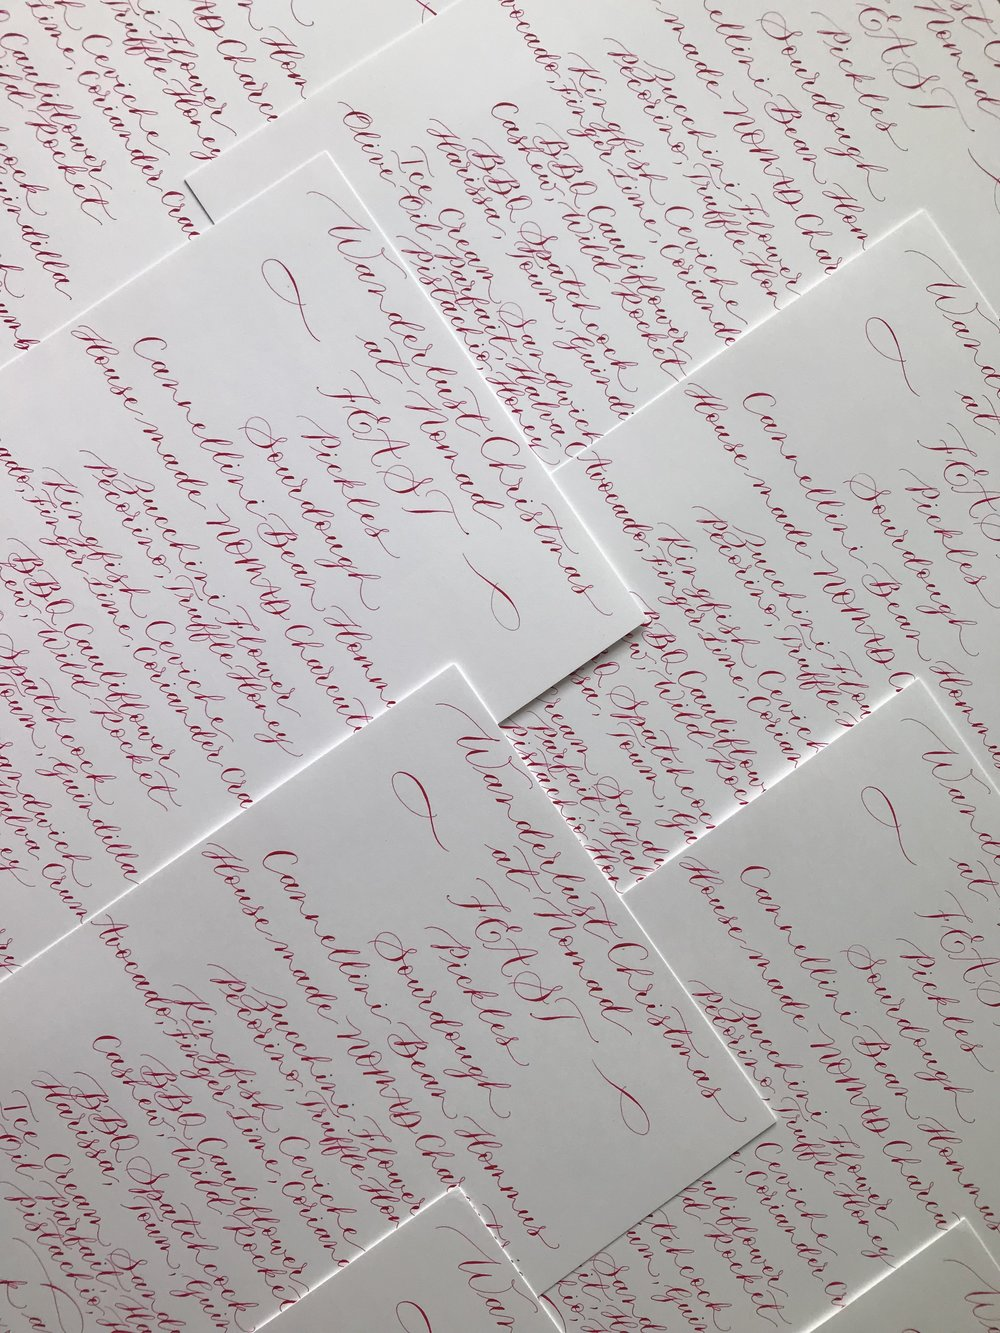 Handwritten menus